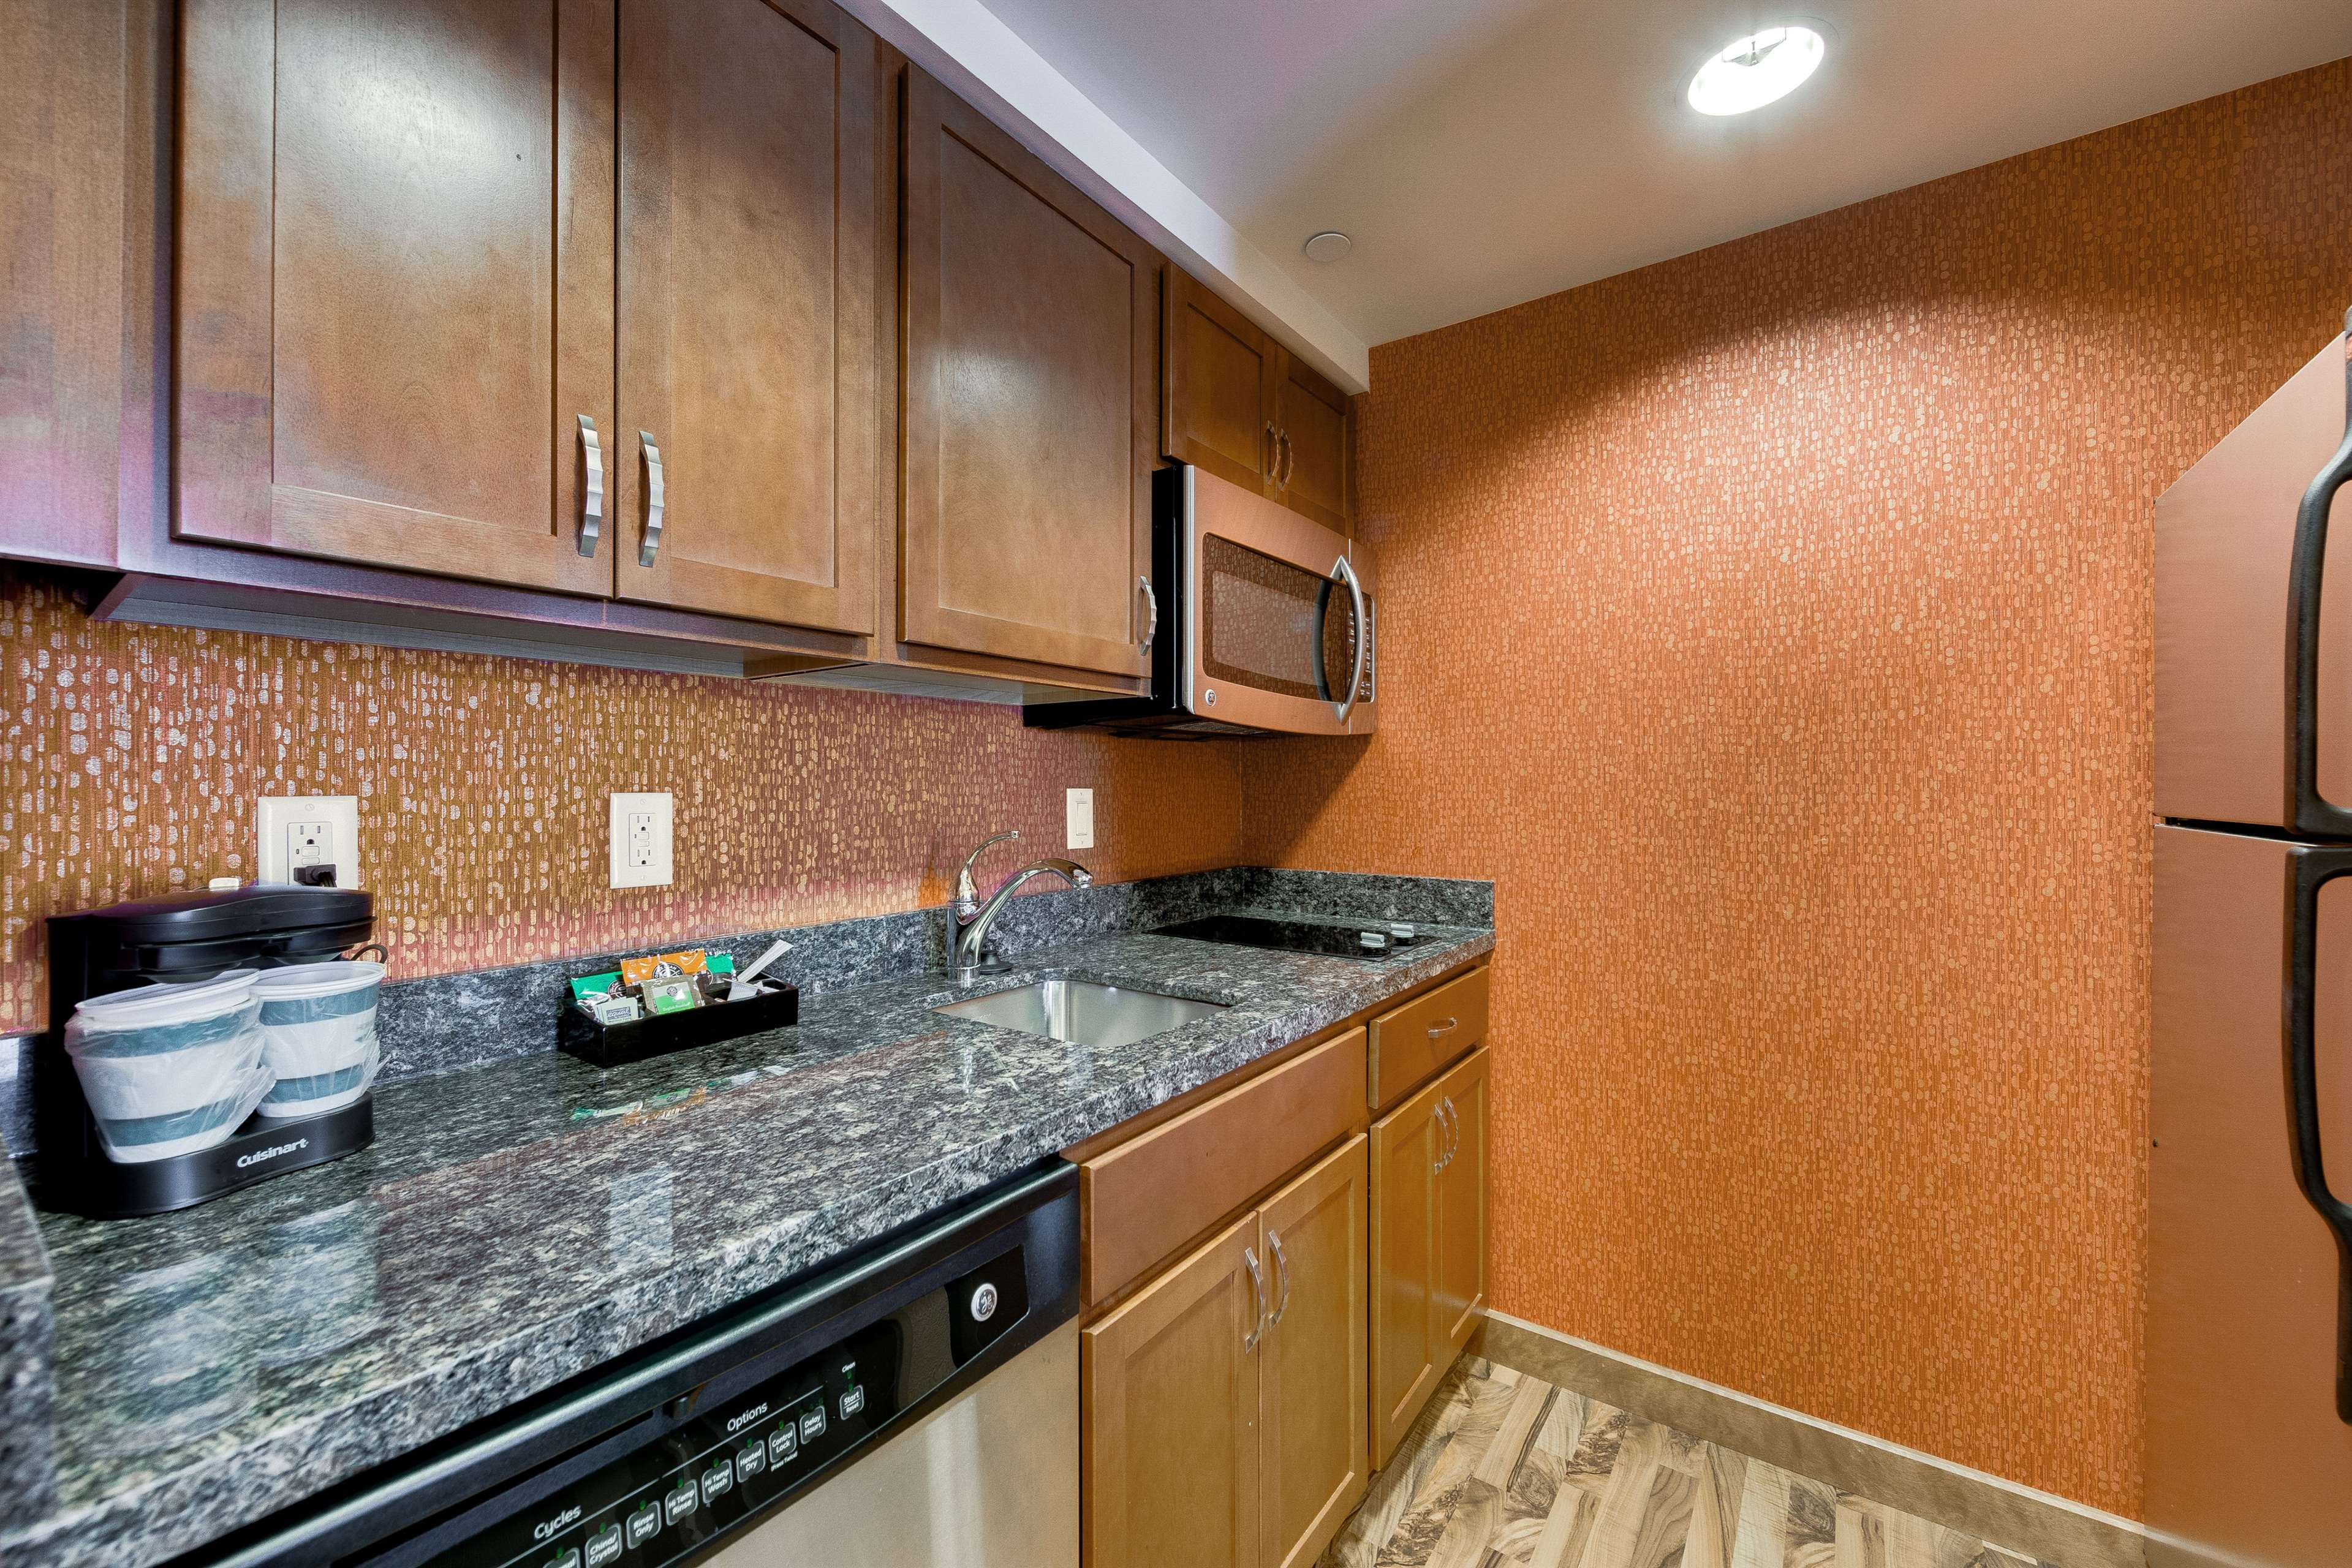 Homewood Suites by Hilton Fort Worth - Medical Center, TX image 22